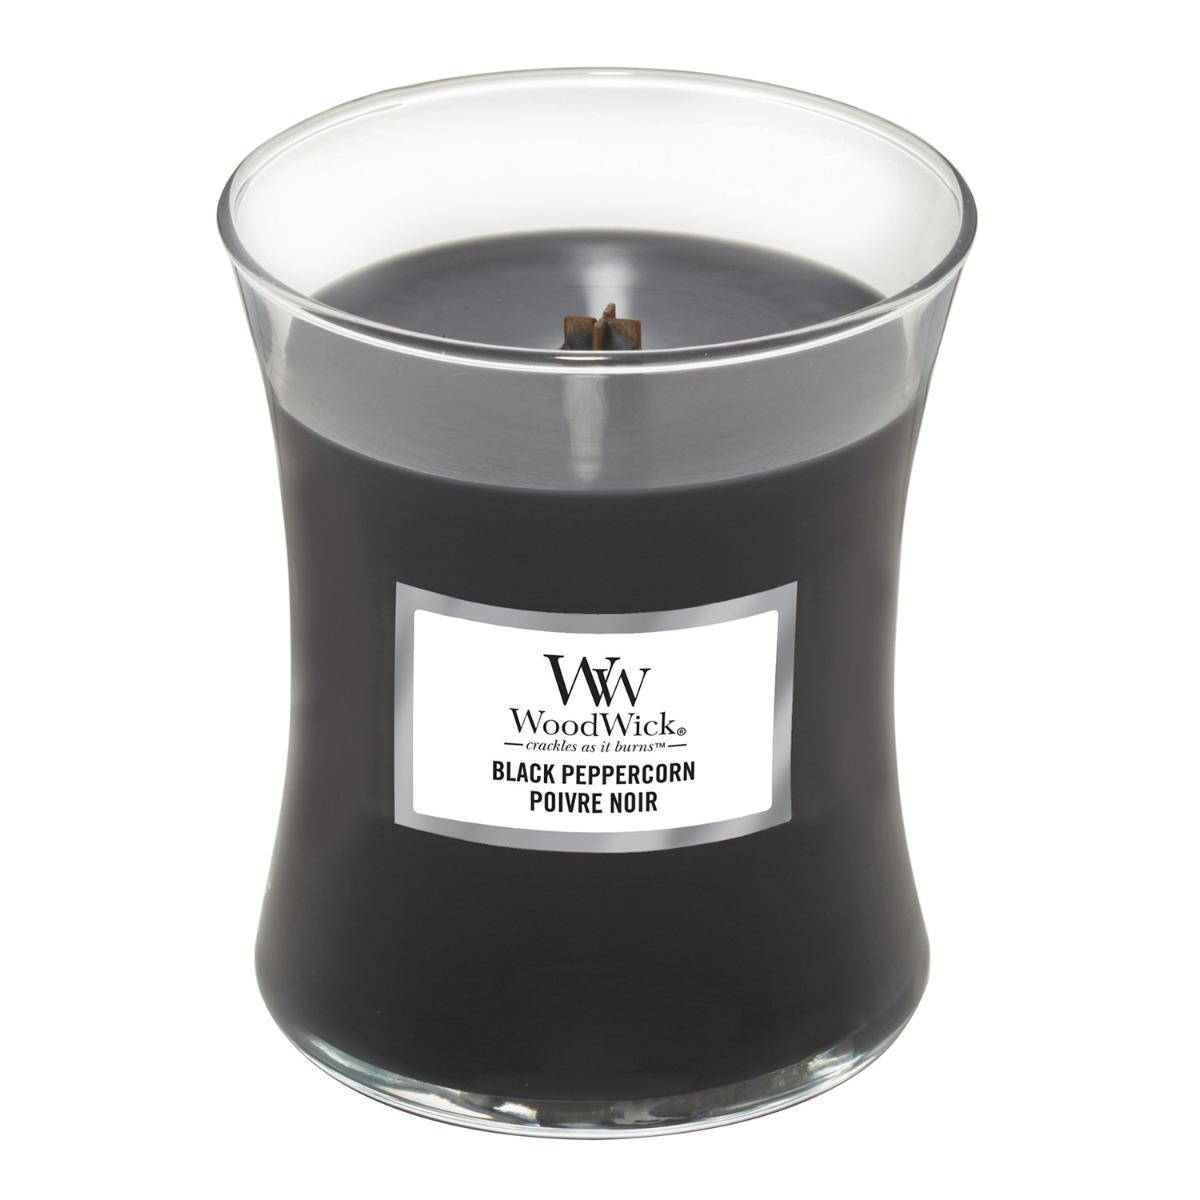 WoodWick Black Peppercorn Medium Hourglass Candle